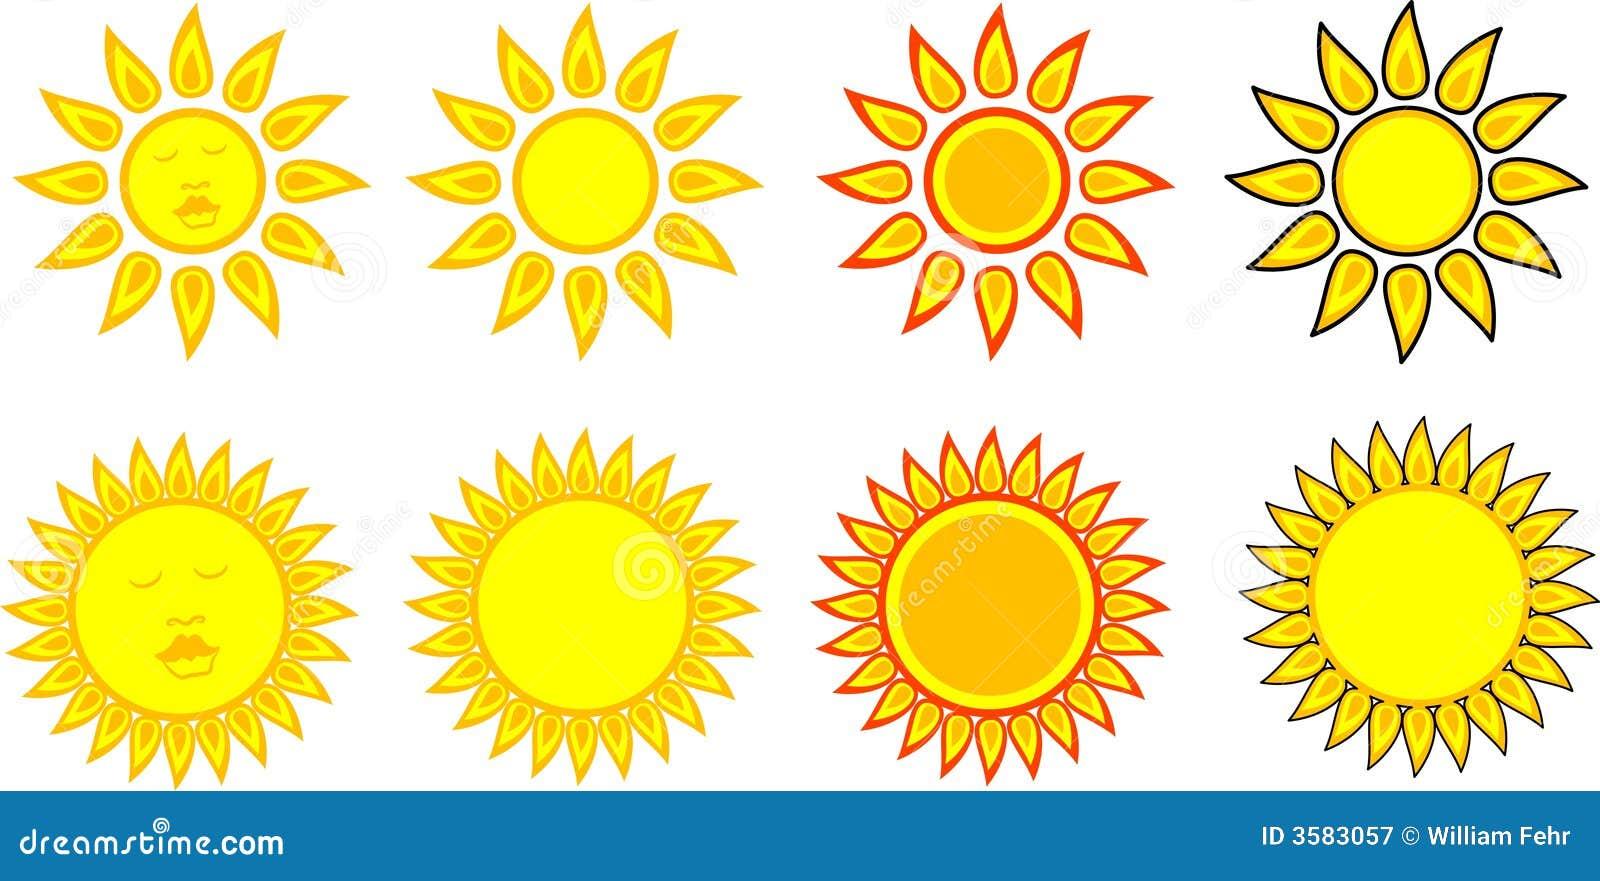 Sun symbols stock vector illustration of symbol orange 8419761 sun symbols royalty free stock photography buycottarizona Images